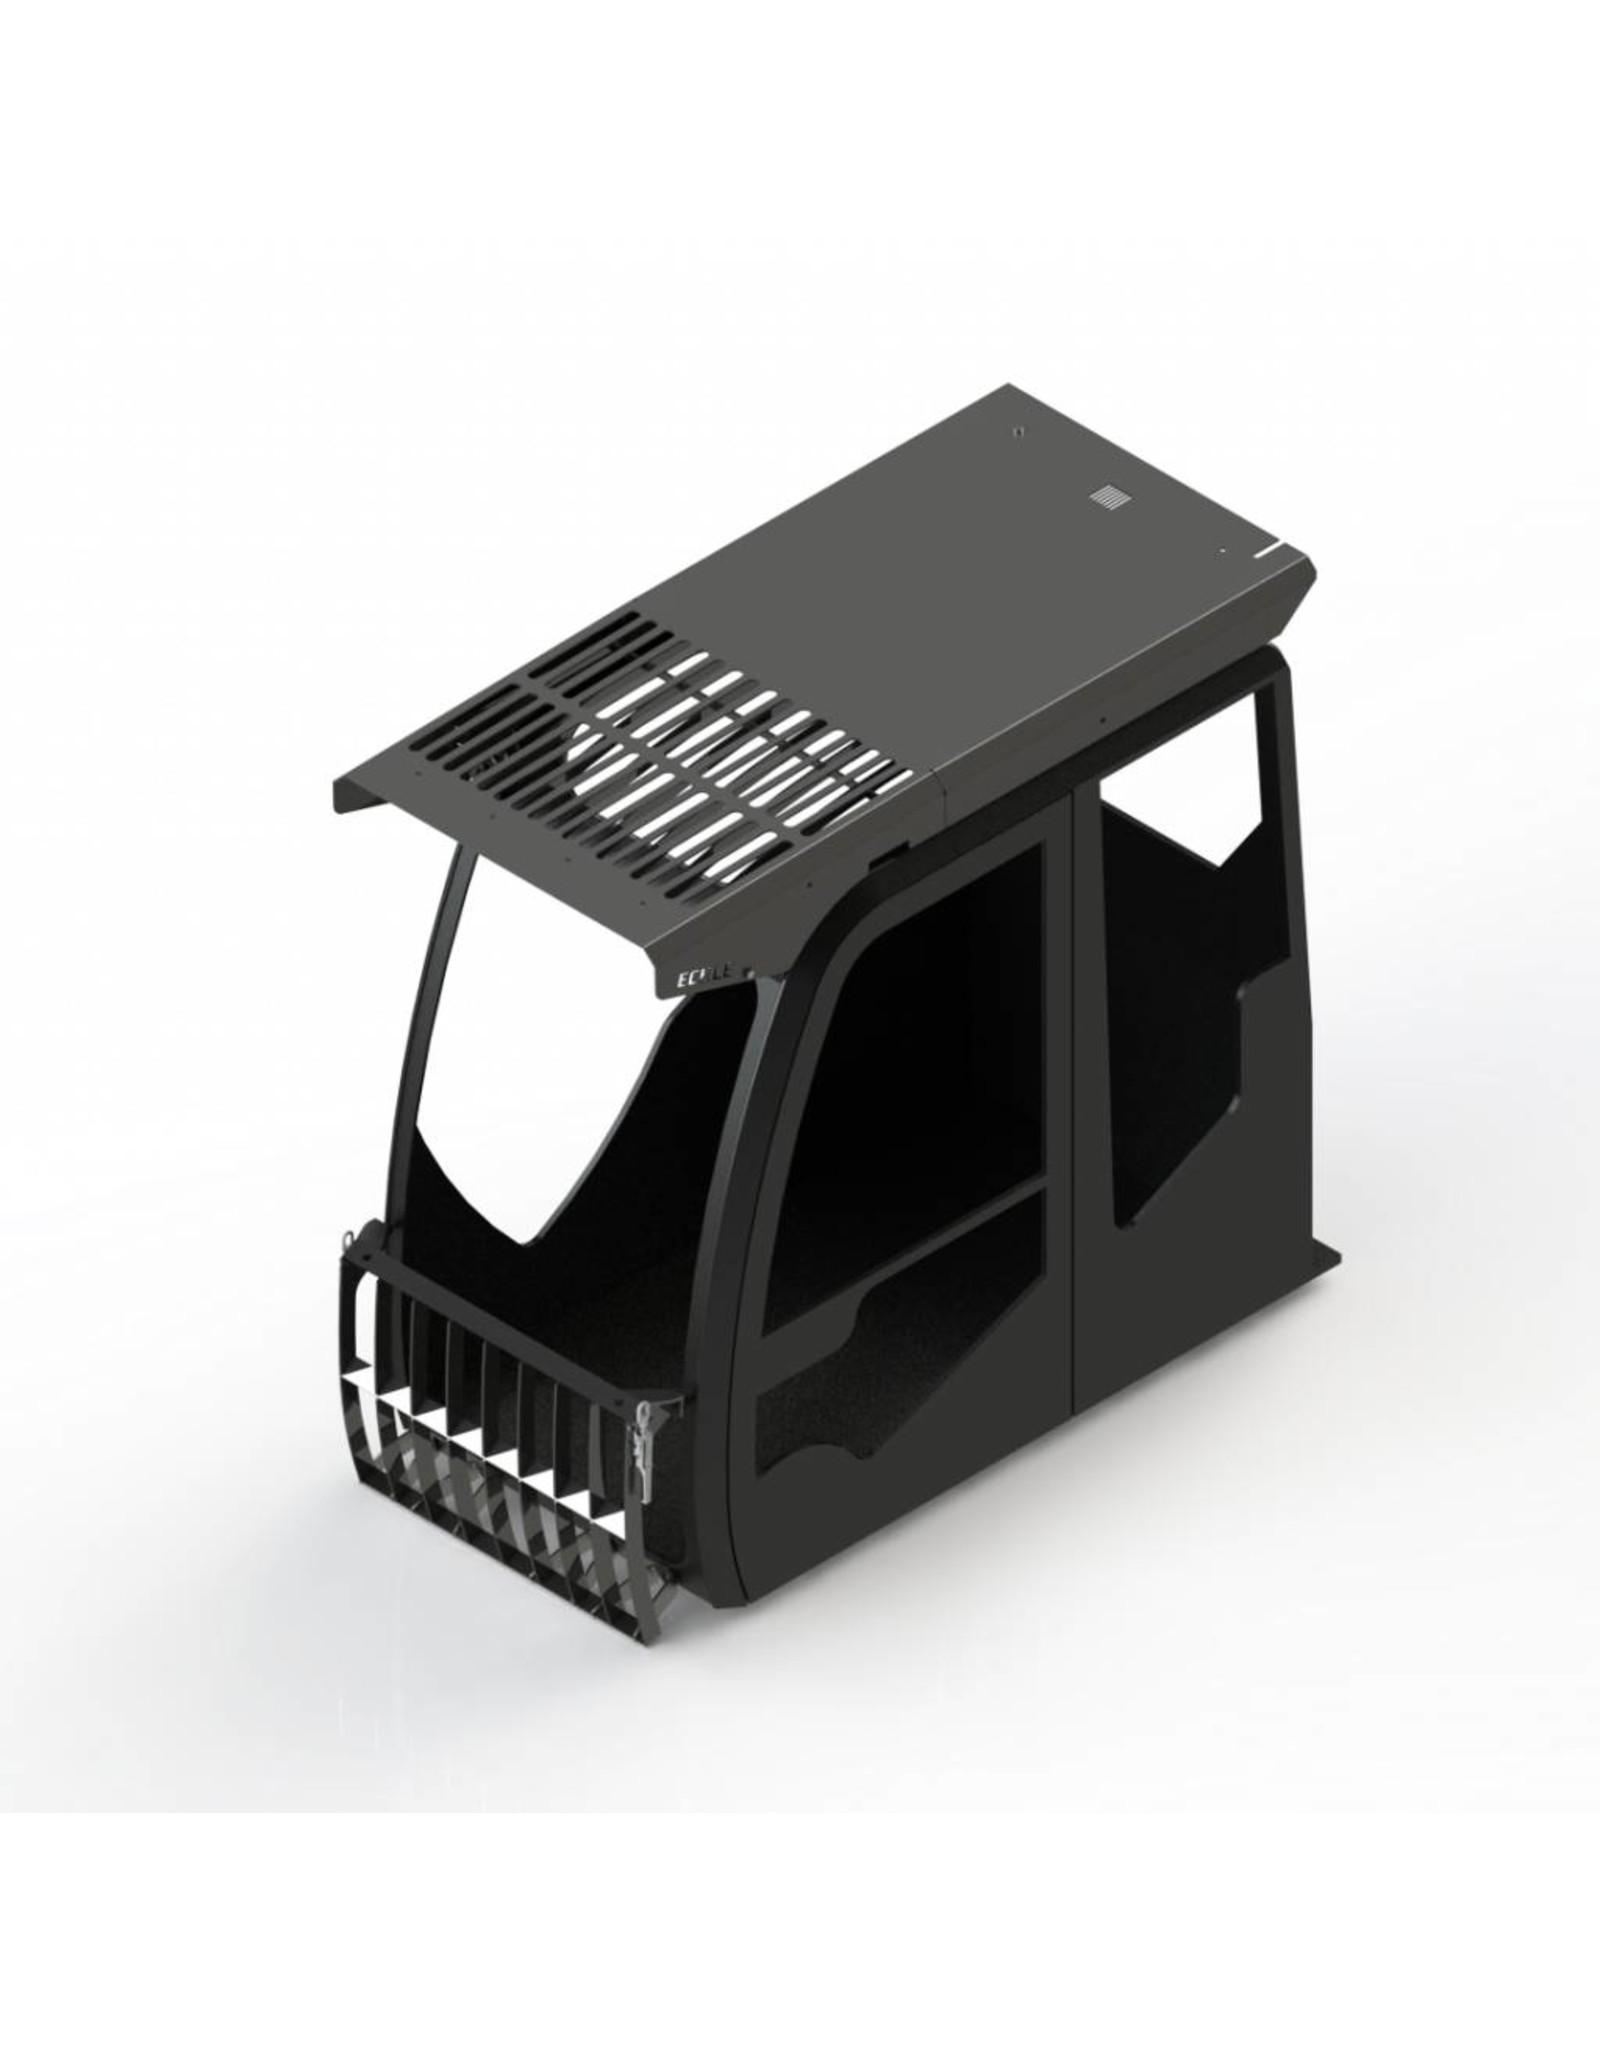 Echle Hartstahl GmbH FOPS for Liebherr R 956